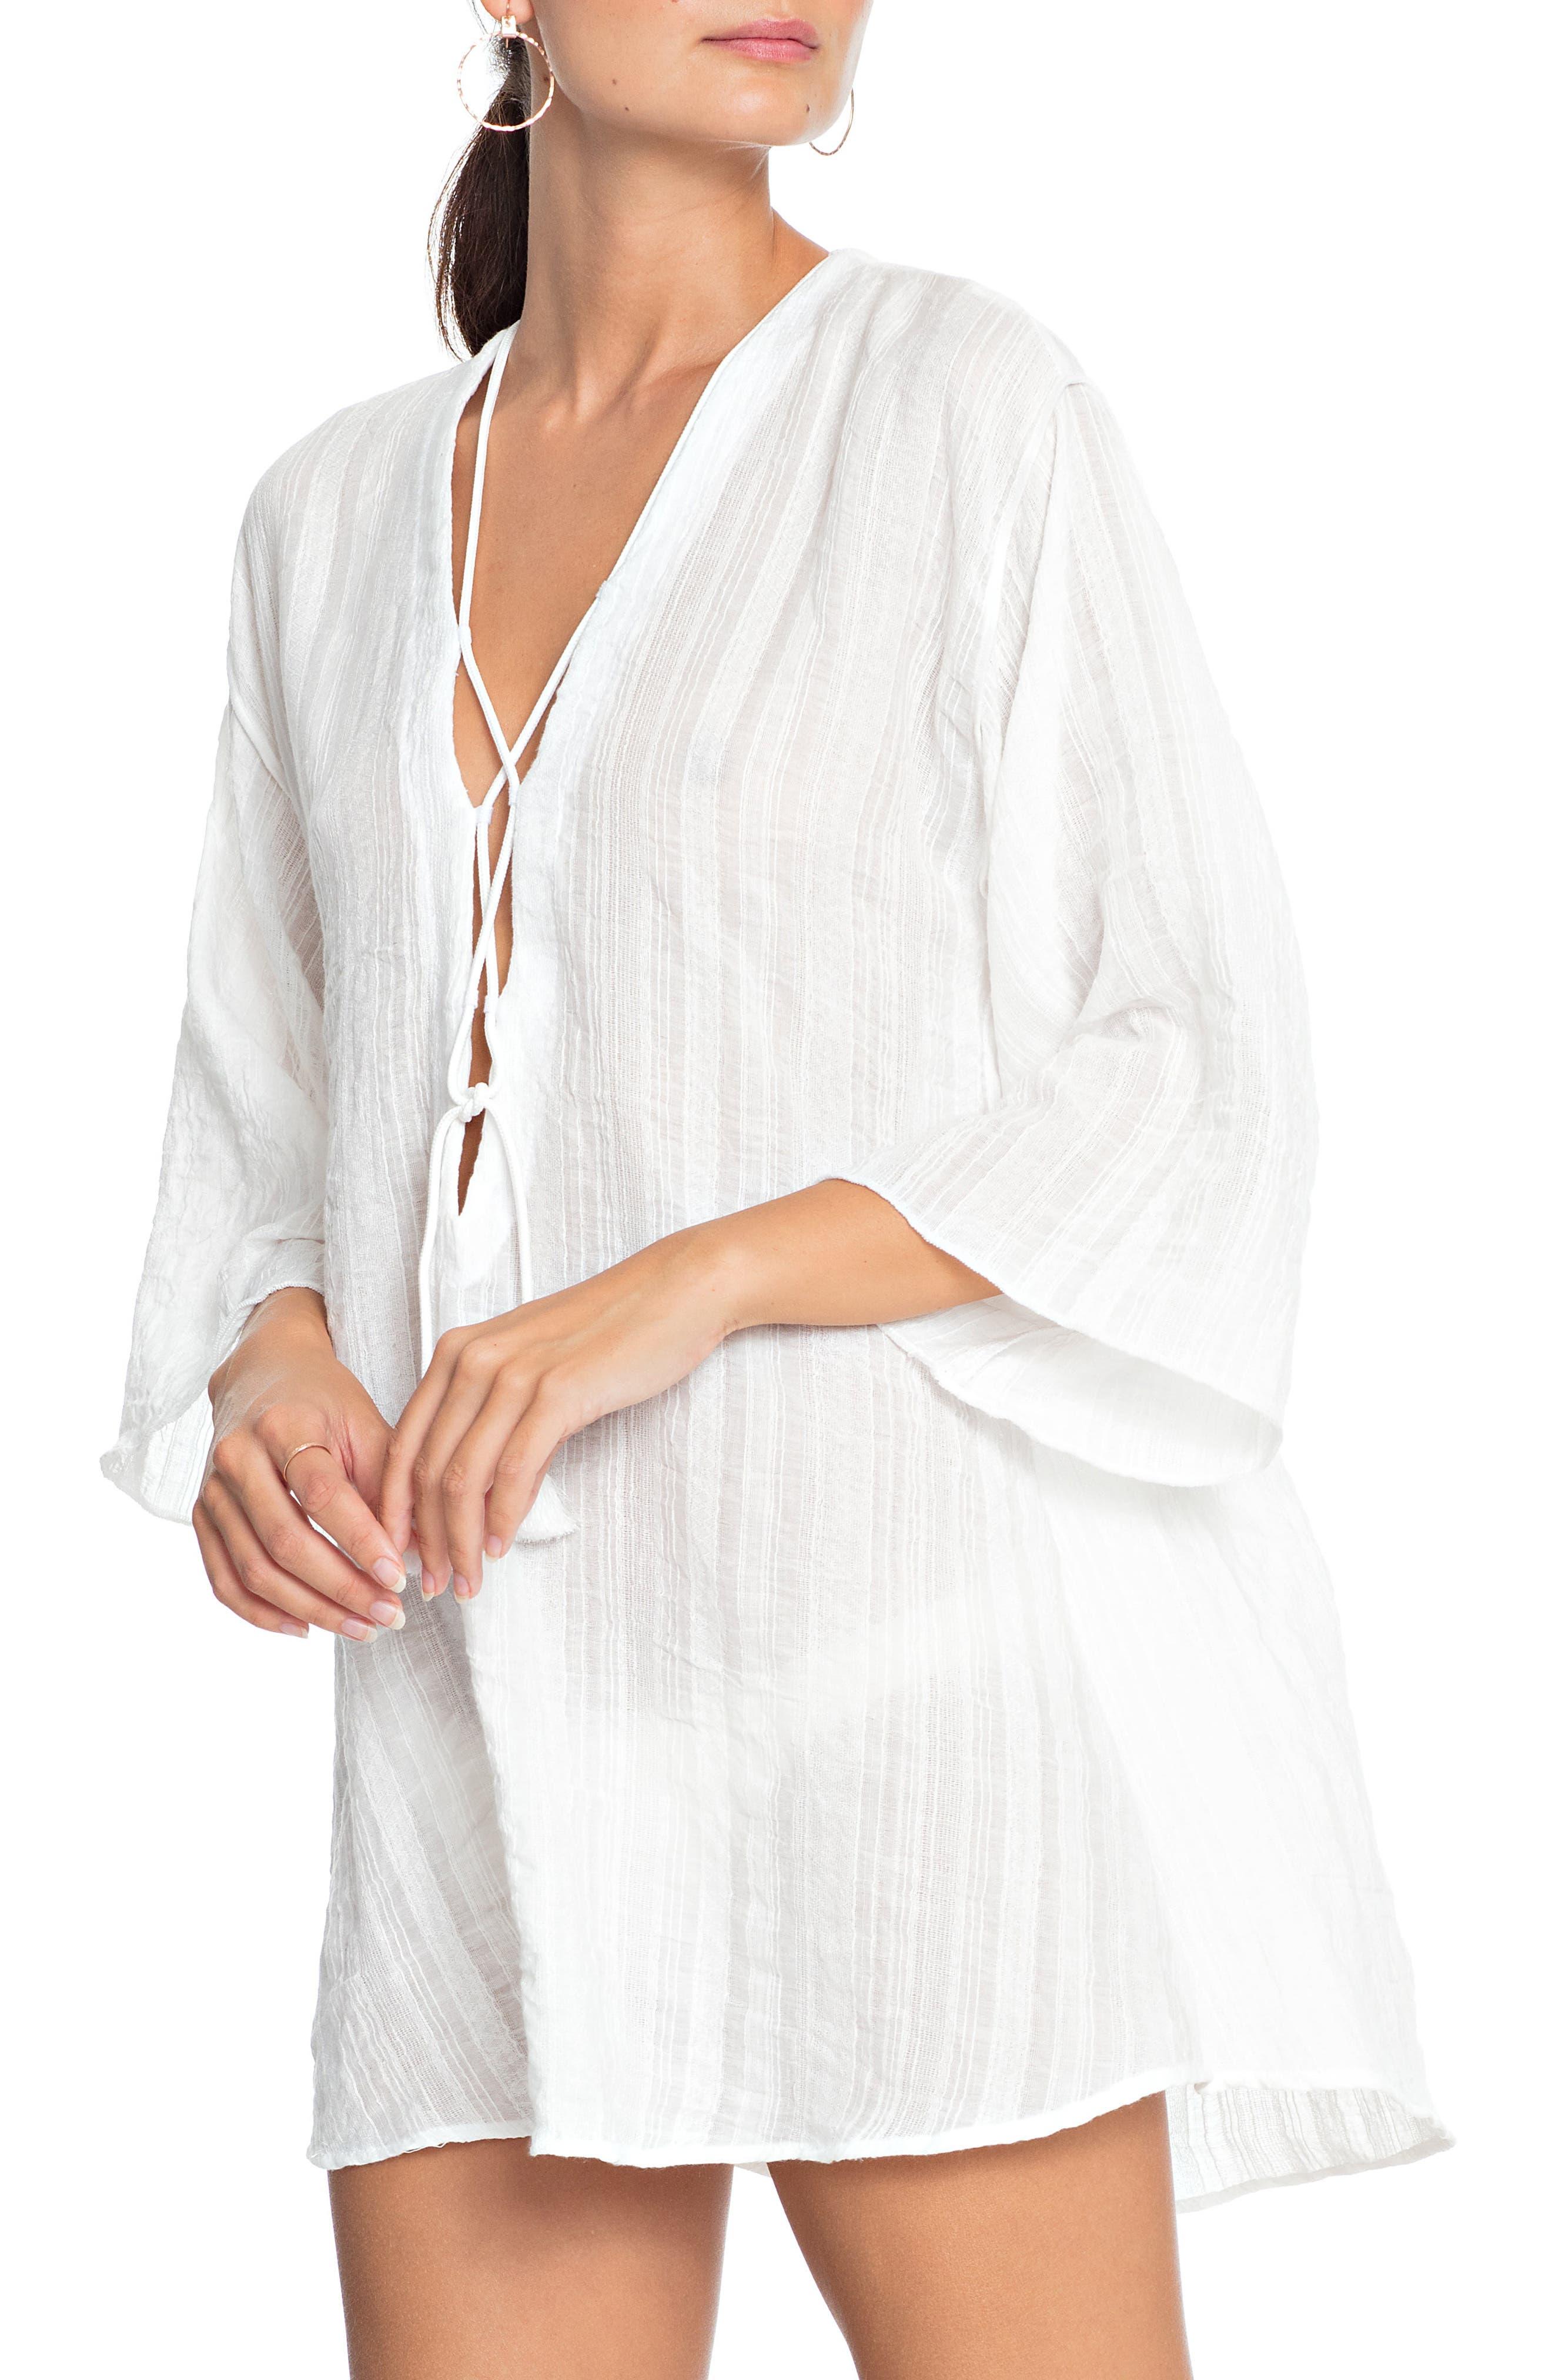 ROBIN PICCONE Michelle Tunic Cover-Up in White